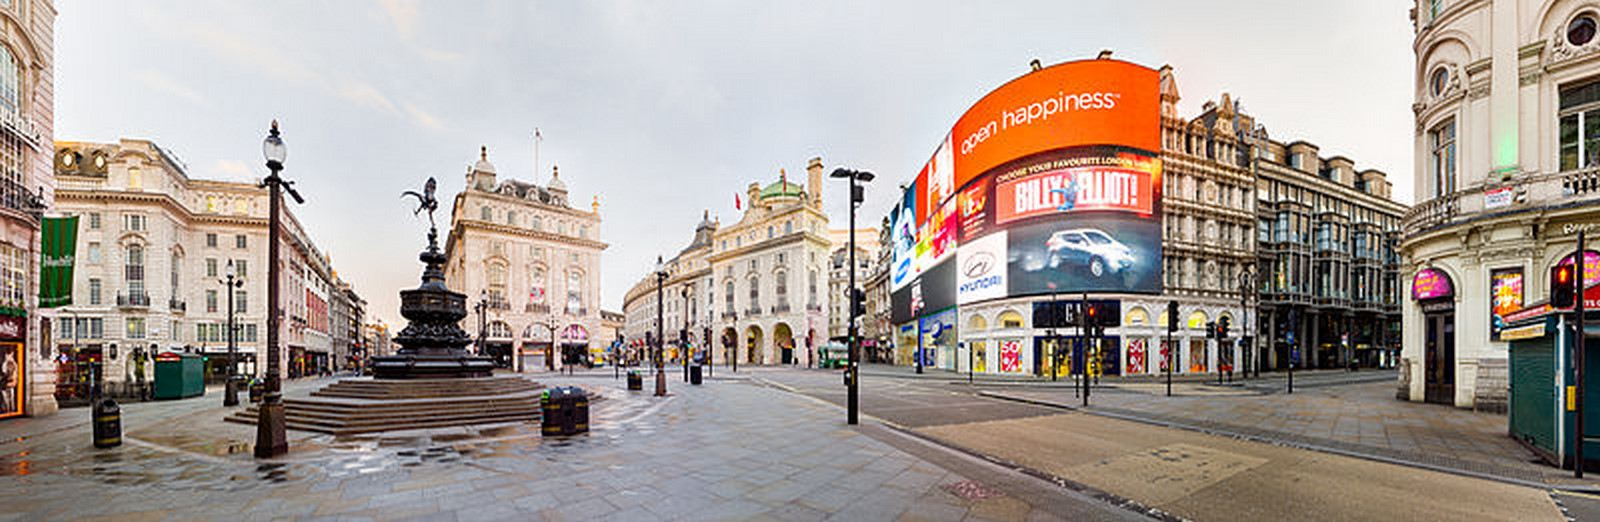 10 Reasons why architects must visit UK Sheet9